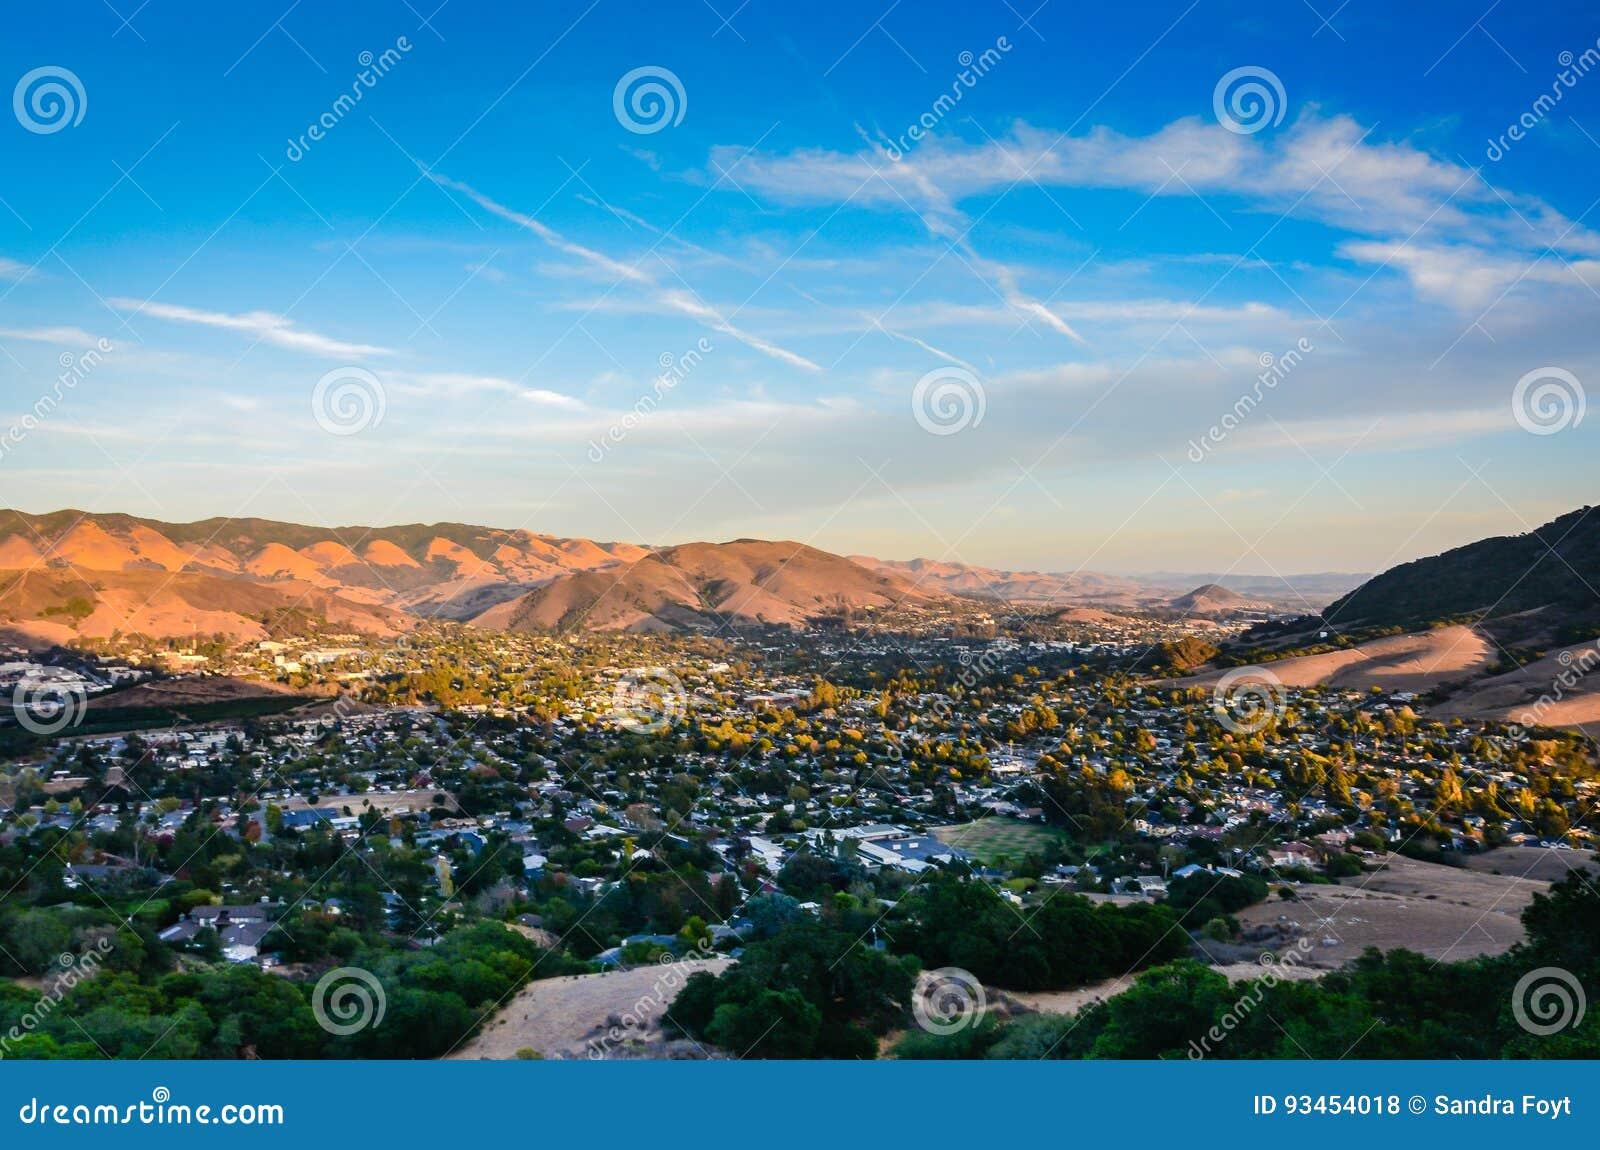 City View - Bishops Peak - San Luis Obispo, CA